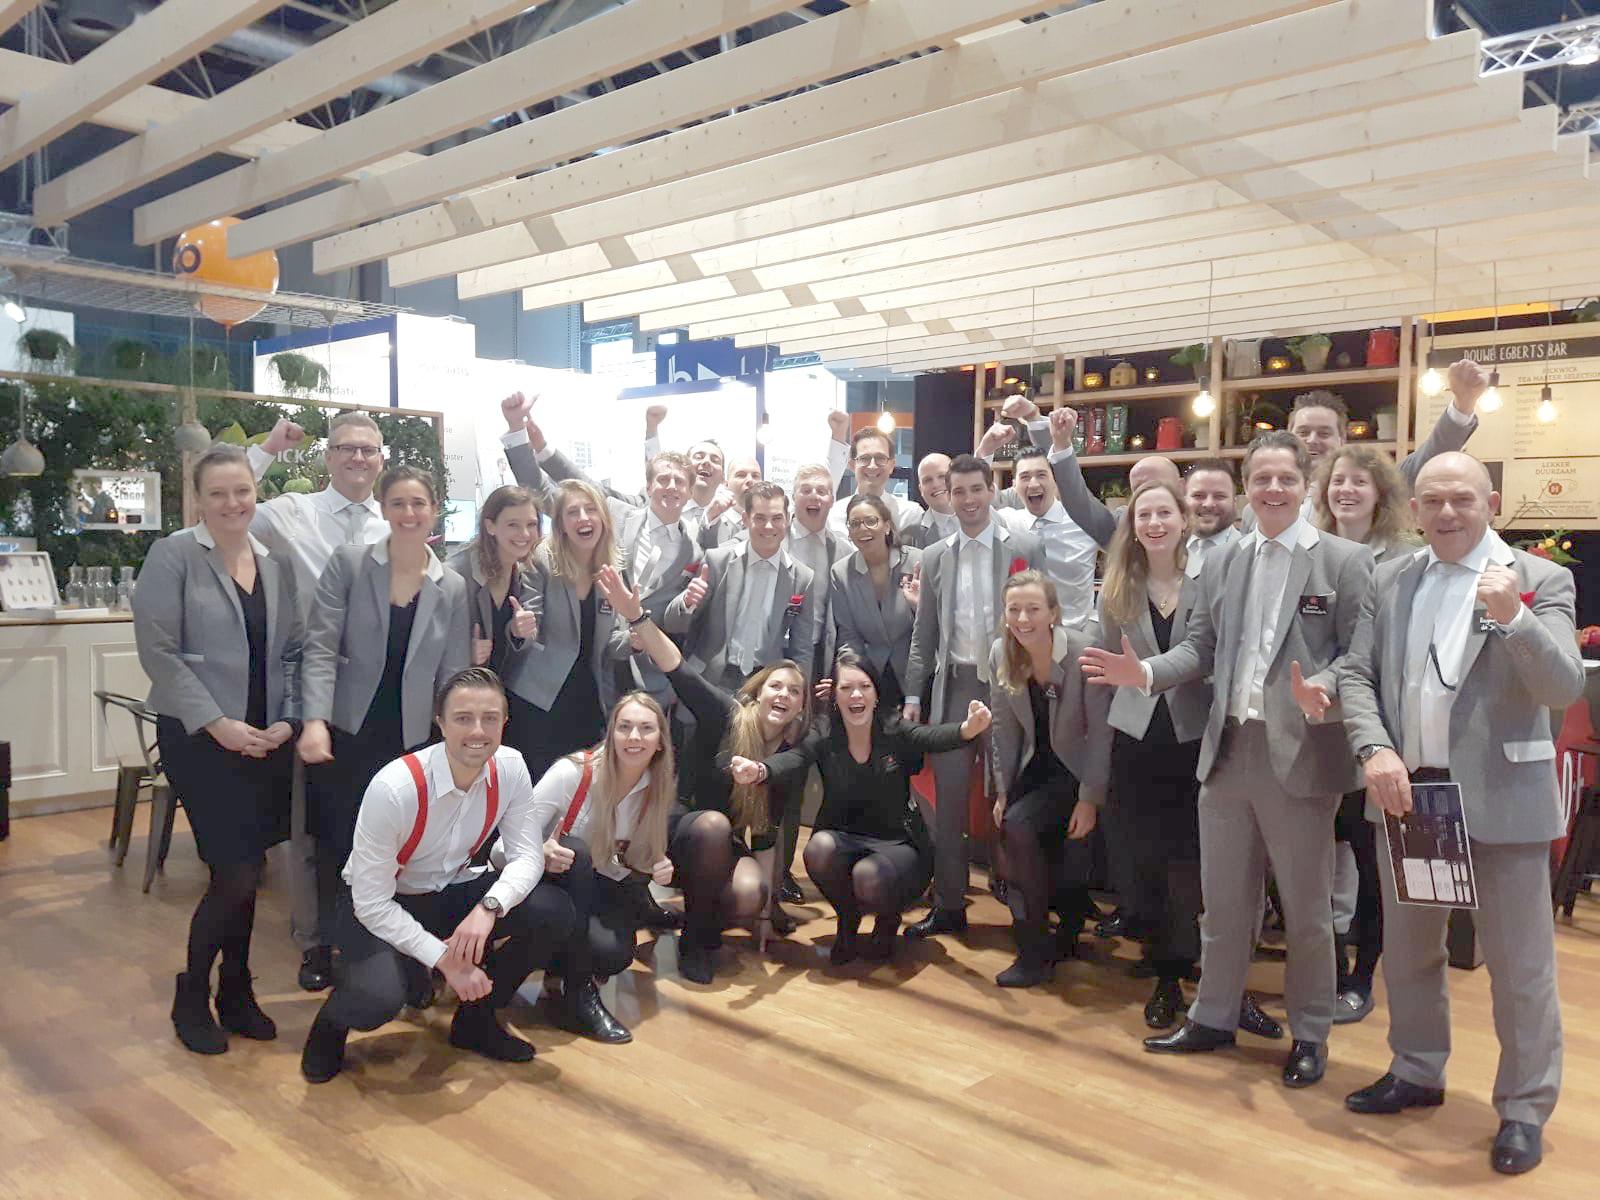 Team Douwe Egberts in ReBlend kleding